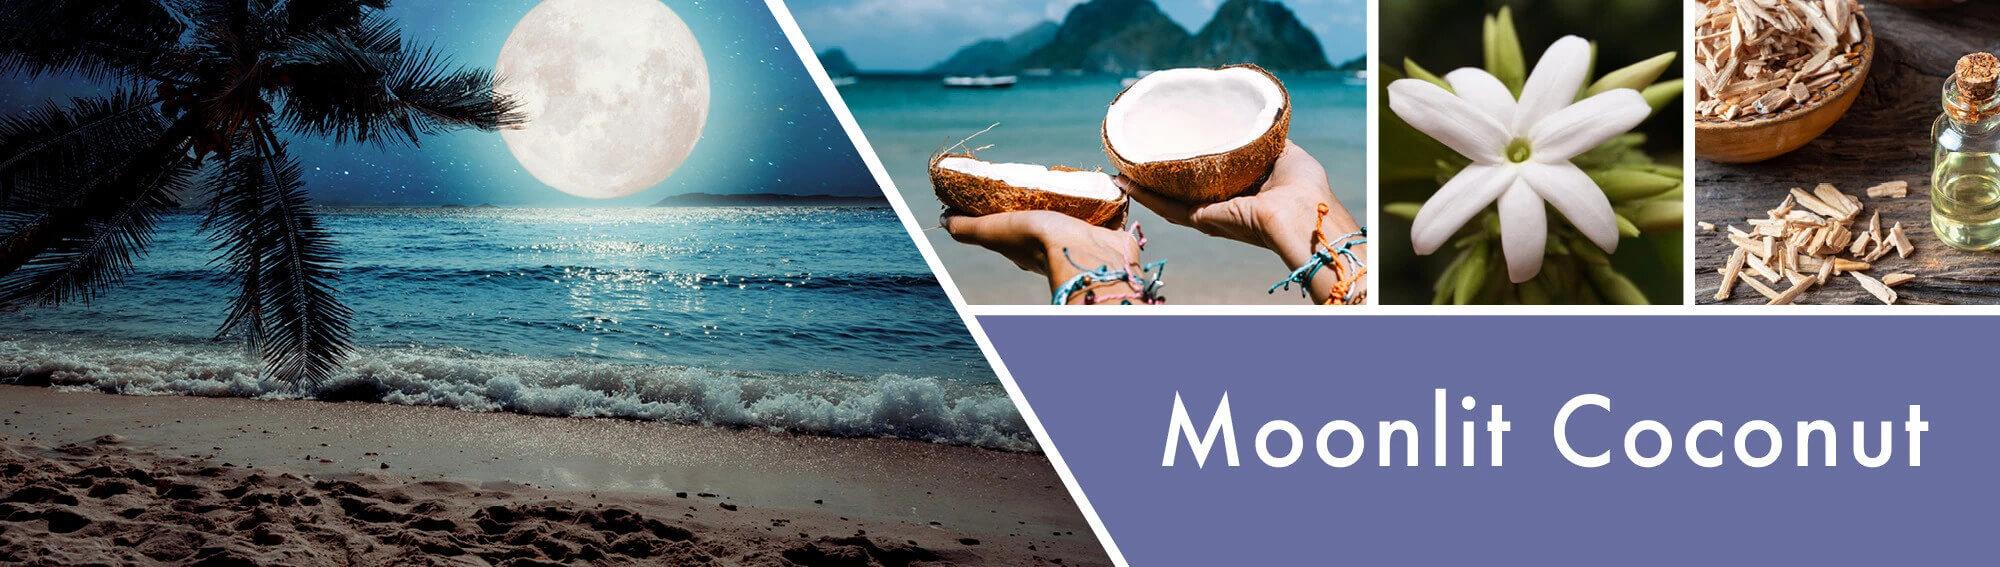 Moonlit-Coconut-FragranceDfdA2UdN2dqdb